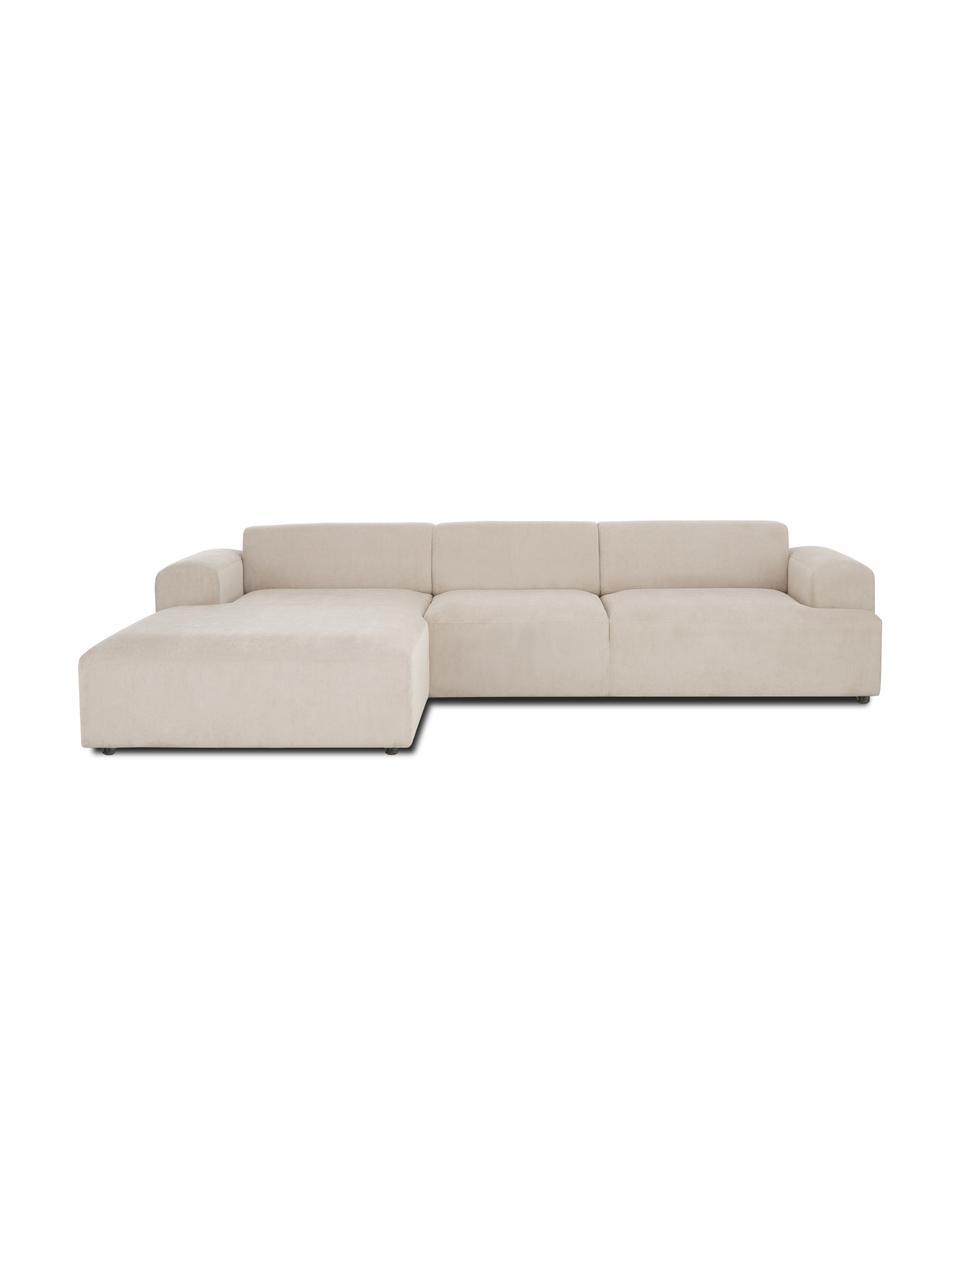 Cord-Ecksofa Melva (4-Sitzer) in Beige, Bezug: Cord (92% Polyester, 8% P, Gestell: Massives Kiefernholz, FSC, Füße: Kunststoff, Cord Beige, B 319 x T 196 cm